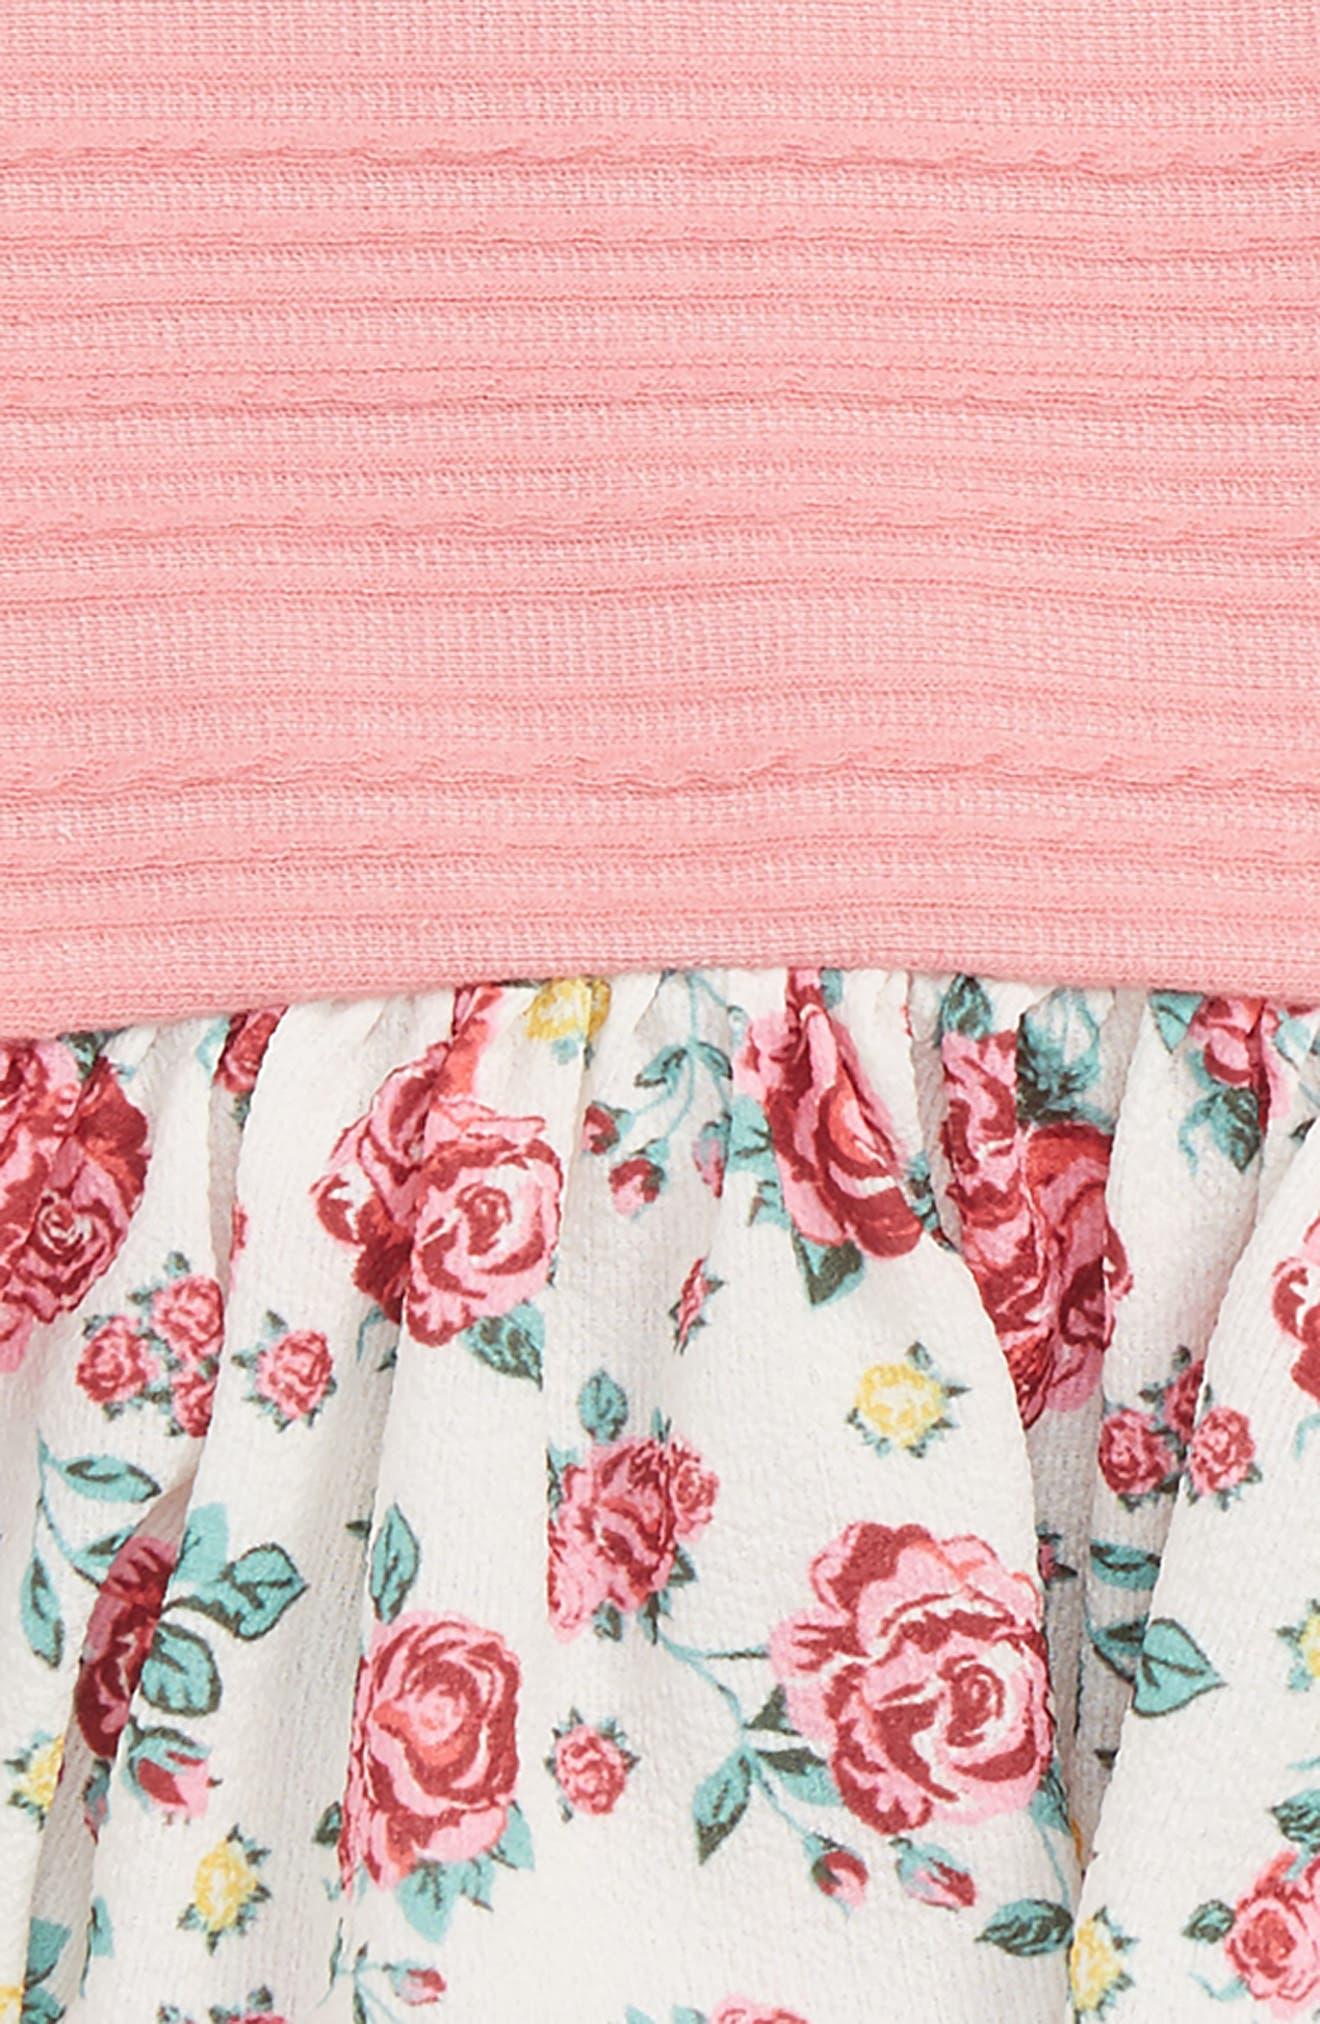 Floral Peplum Dress & Leggings Set,                             Alternate thumbnail 2, color,                             Pink